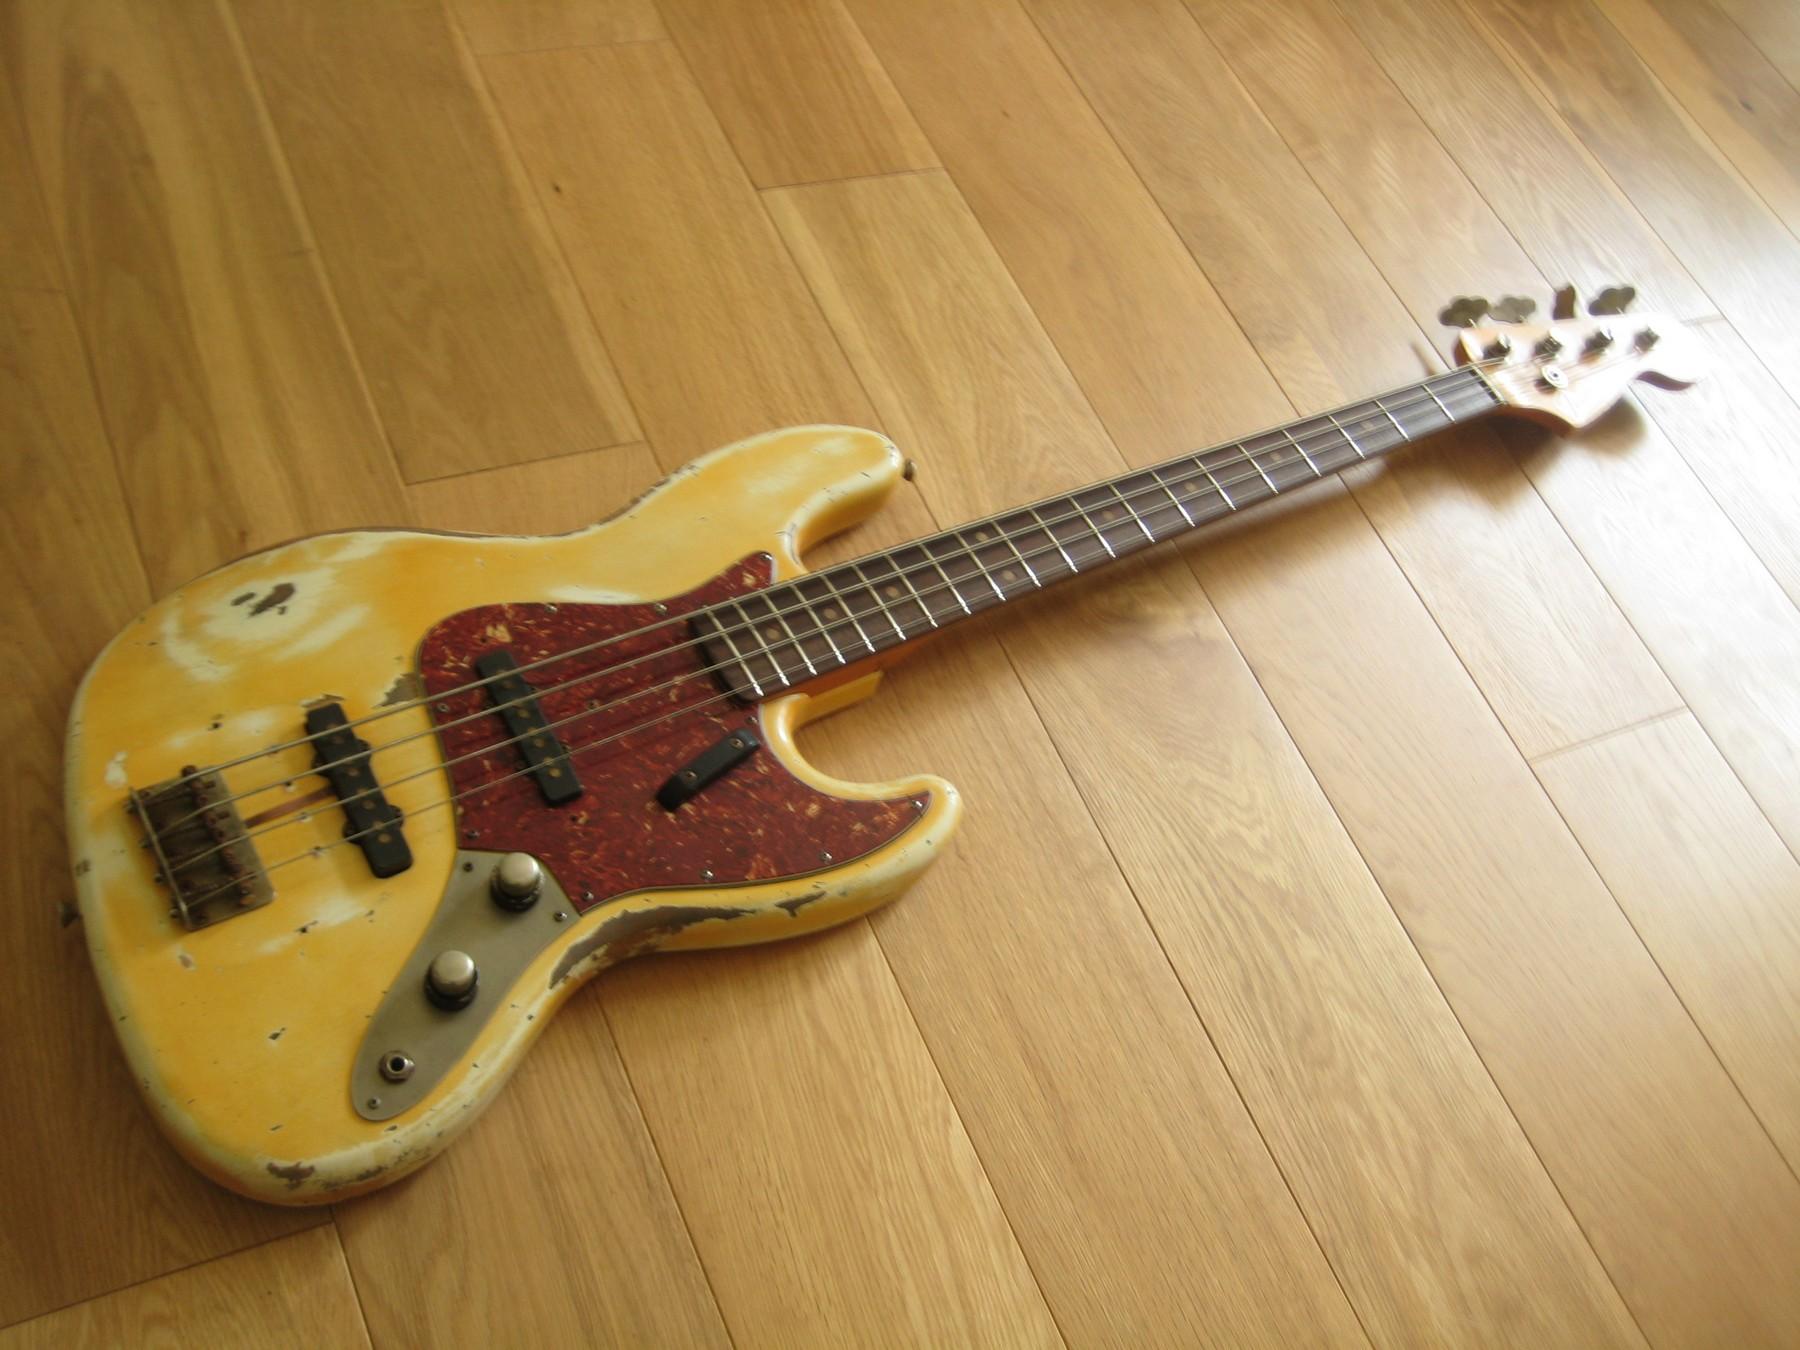 limelight 00131 j bass classic cool guitars. Black Bedroom Furniture Sets. Home Design Ideas